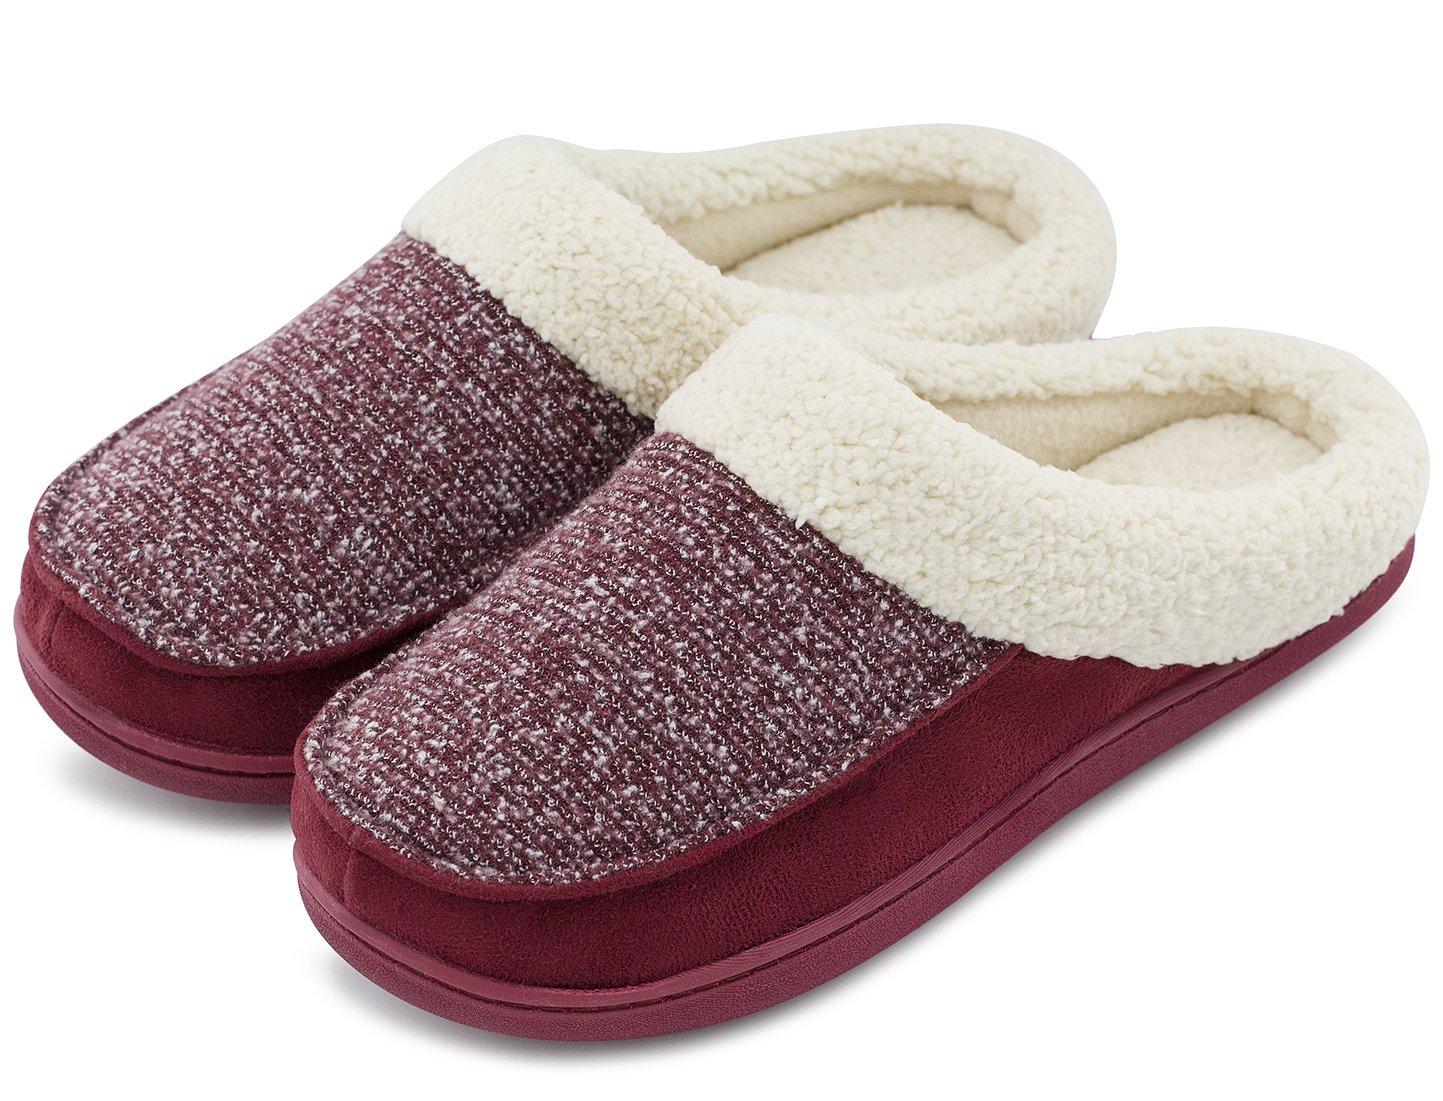 f3bb1de402d50d Women's & Men's Comfort Memory Foam Slippers Fuzzy Wool Plush Slip-on Clog  House Shoes